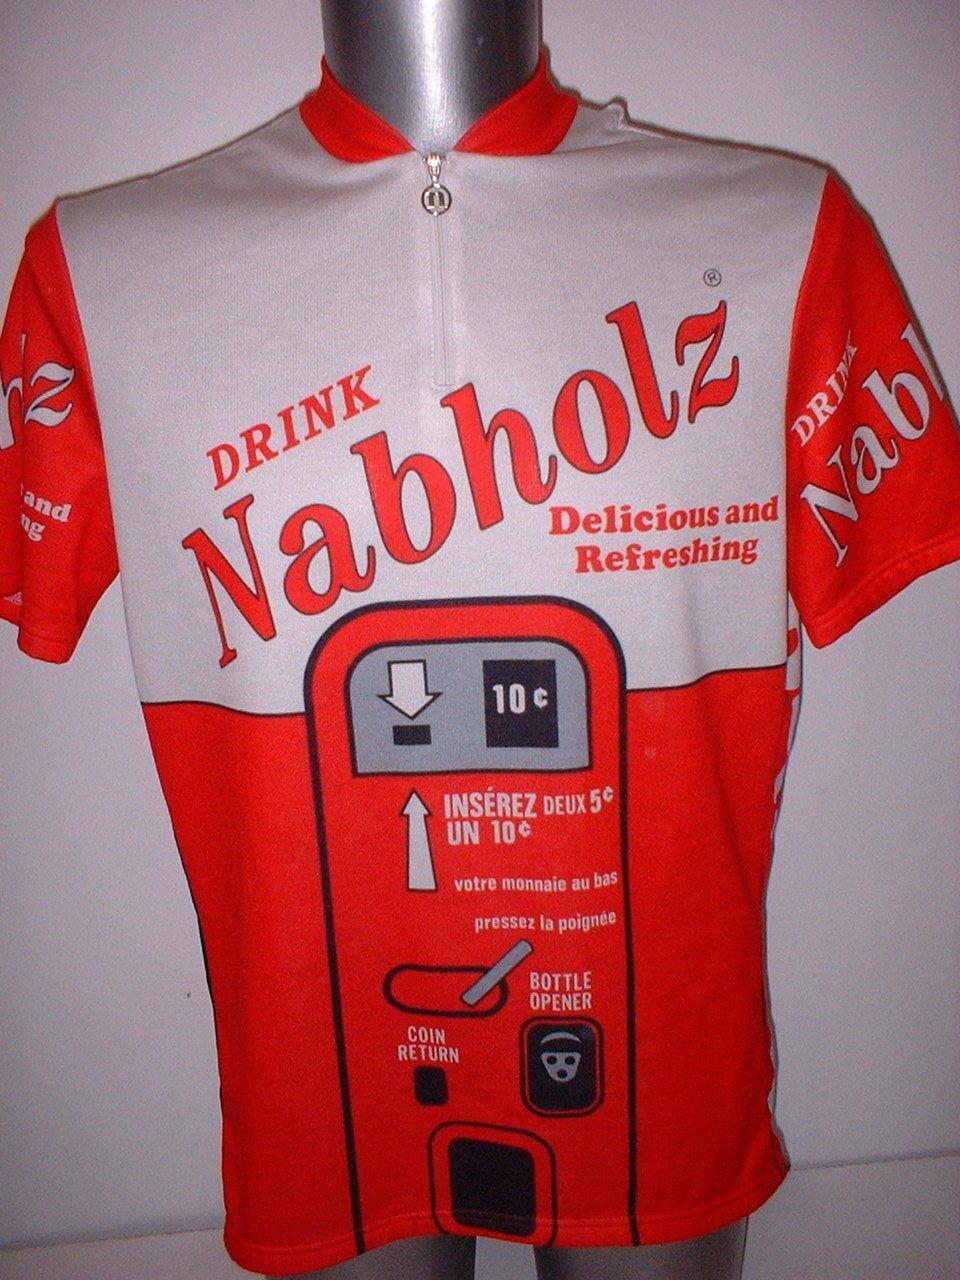 Nabholz Drink Shirt Jersey Adult XL Cycling Cycle Bike Ciclismo Top Mountain